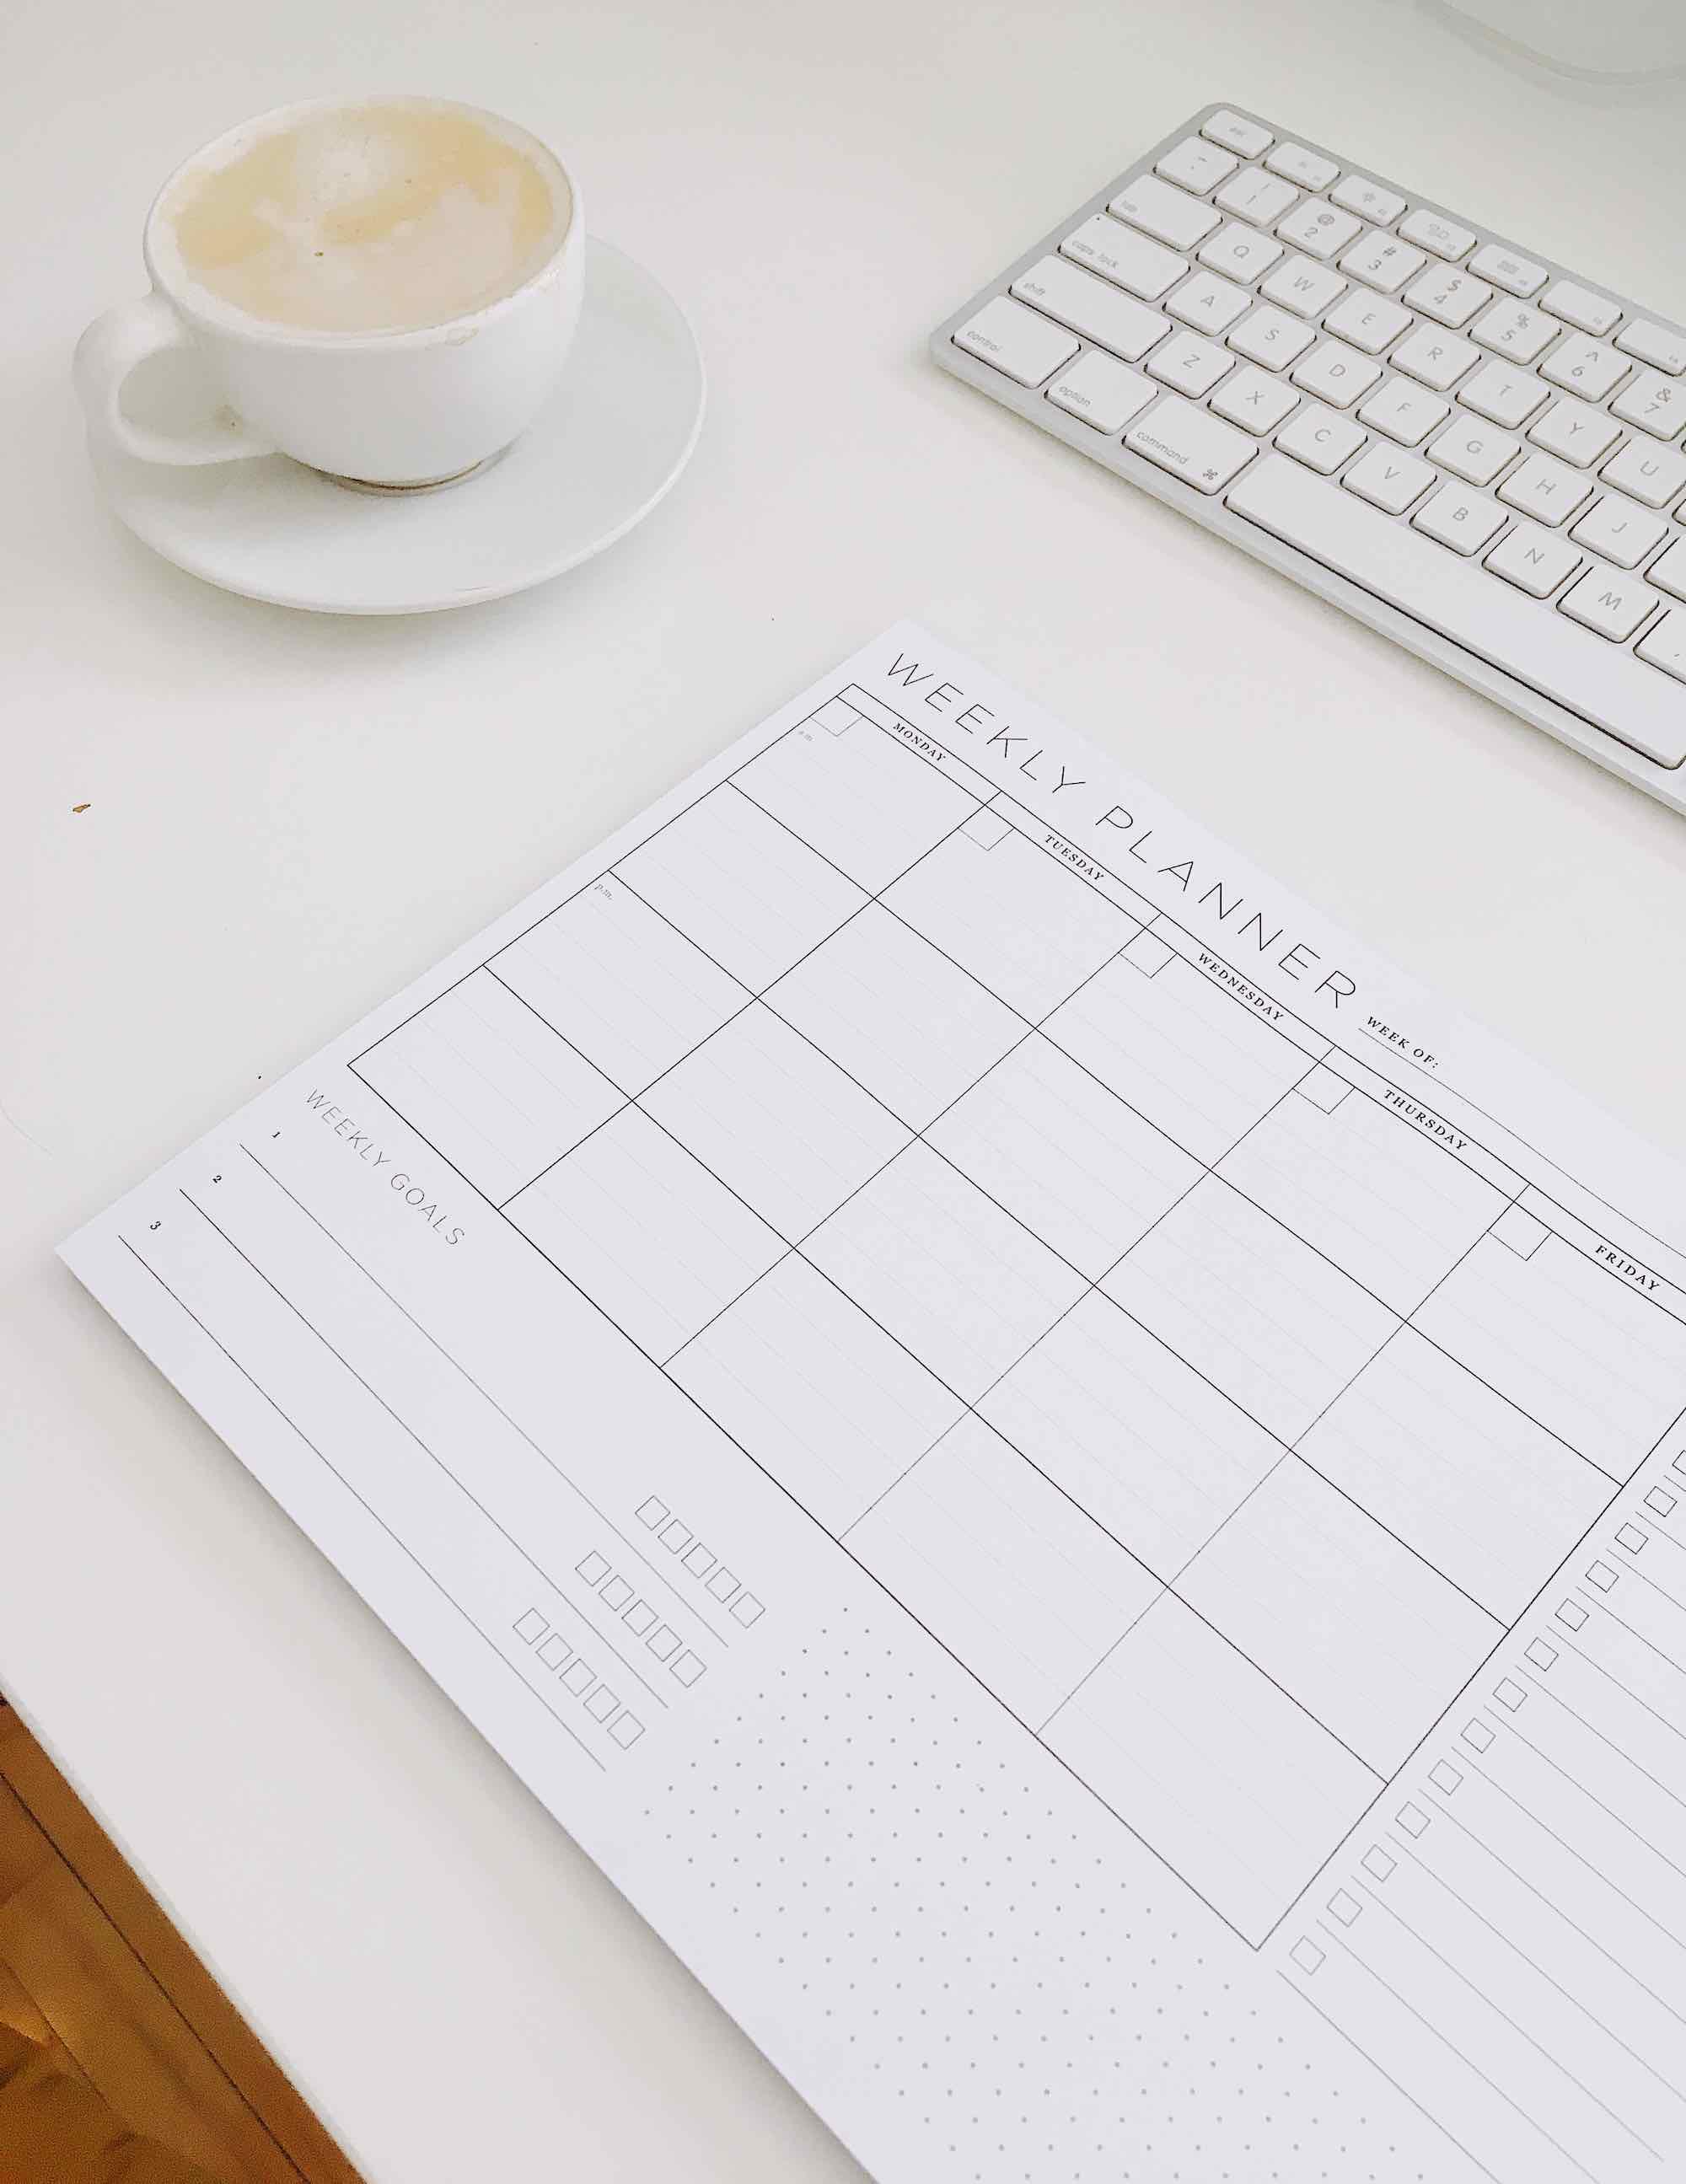 Planer na biurko